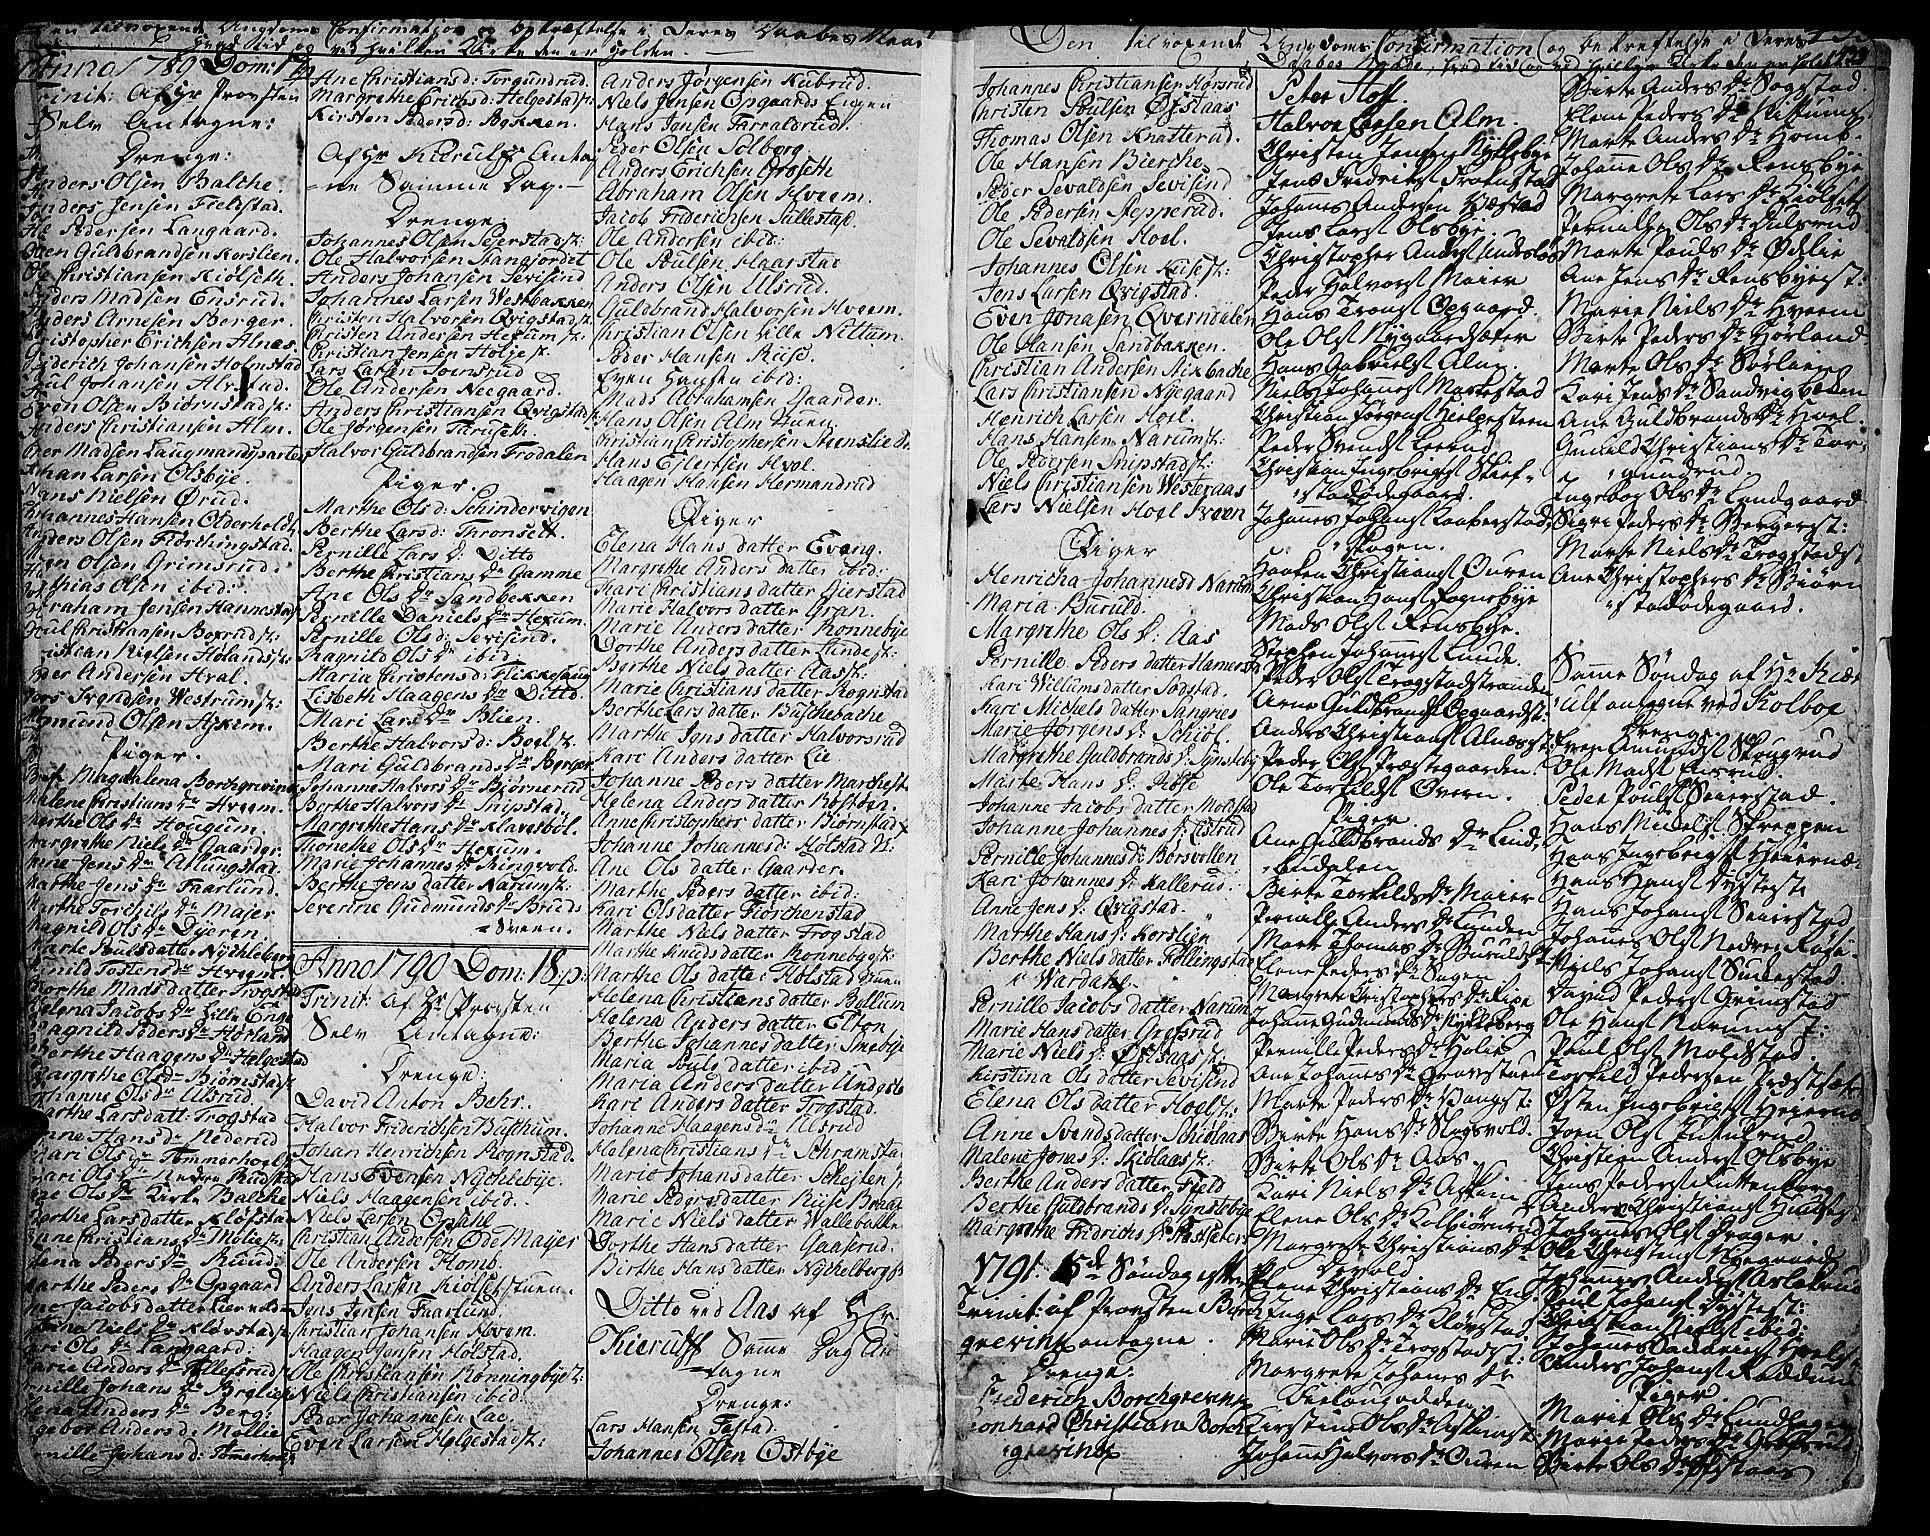 SAH, Toten prestekontor, Ministerialbok nr. 6, 1773-1793, s. 433